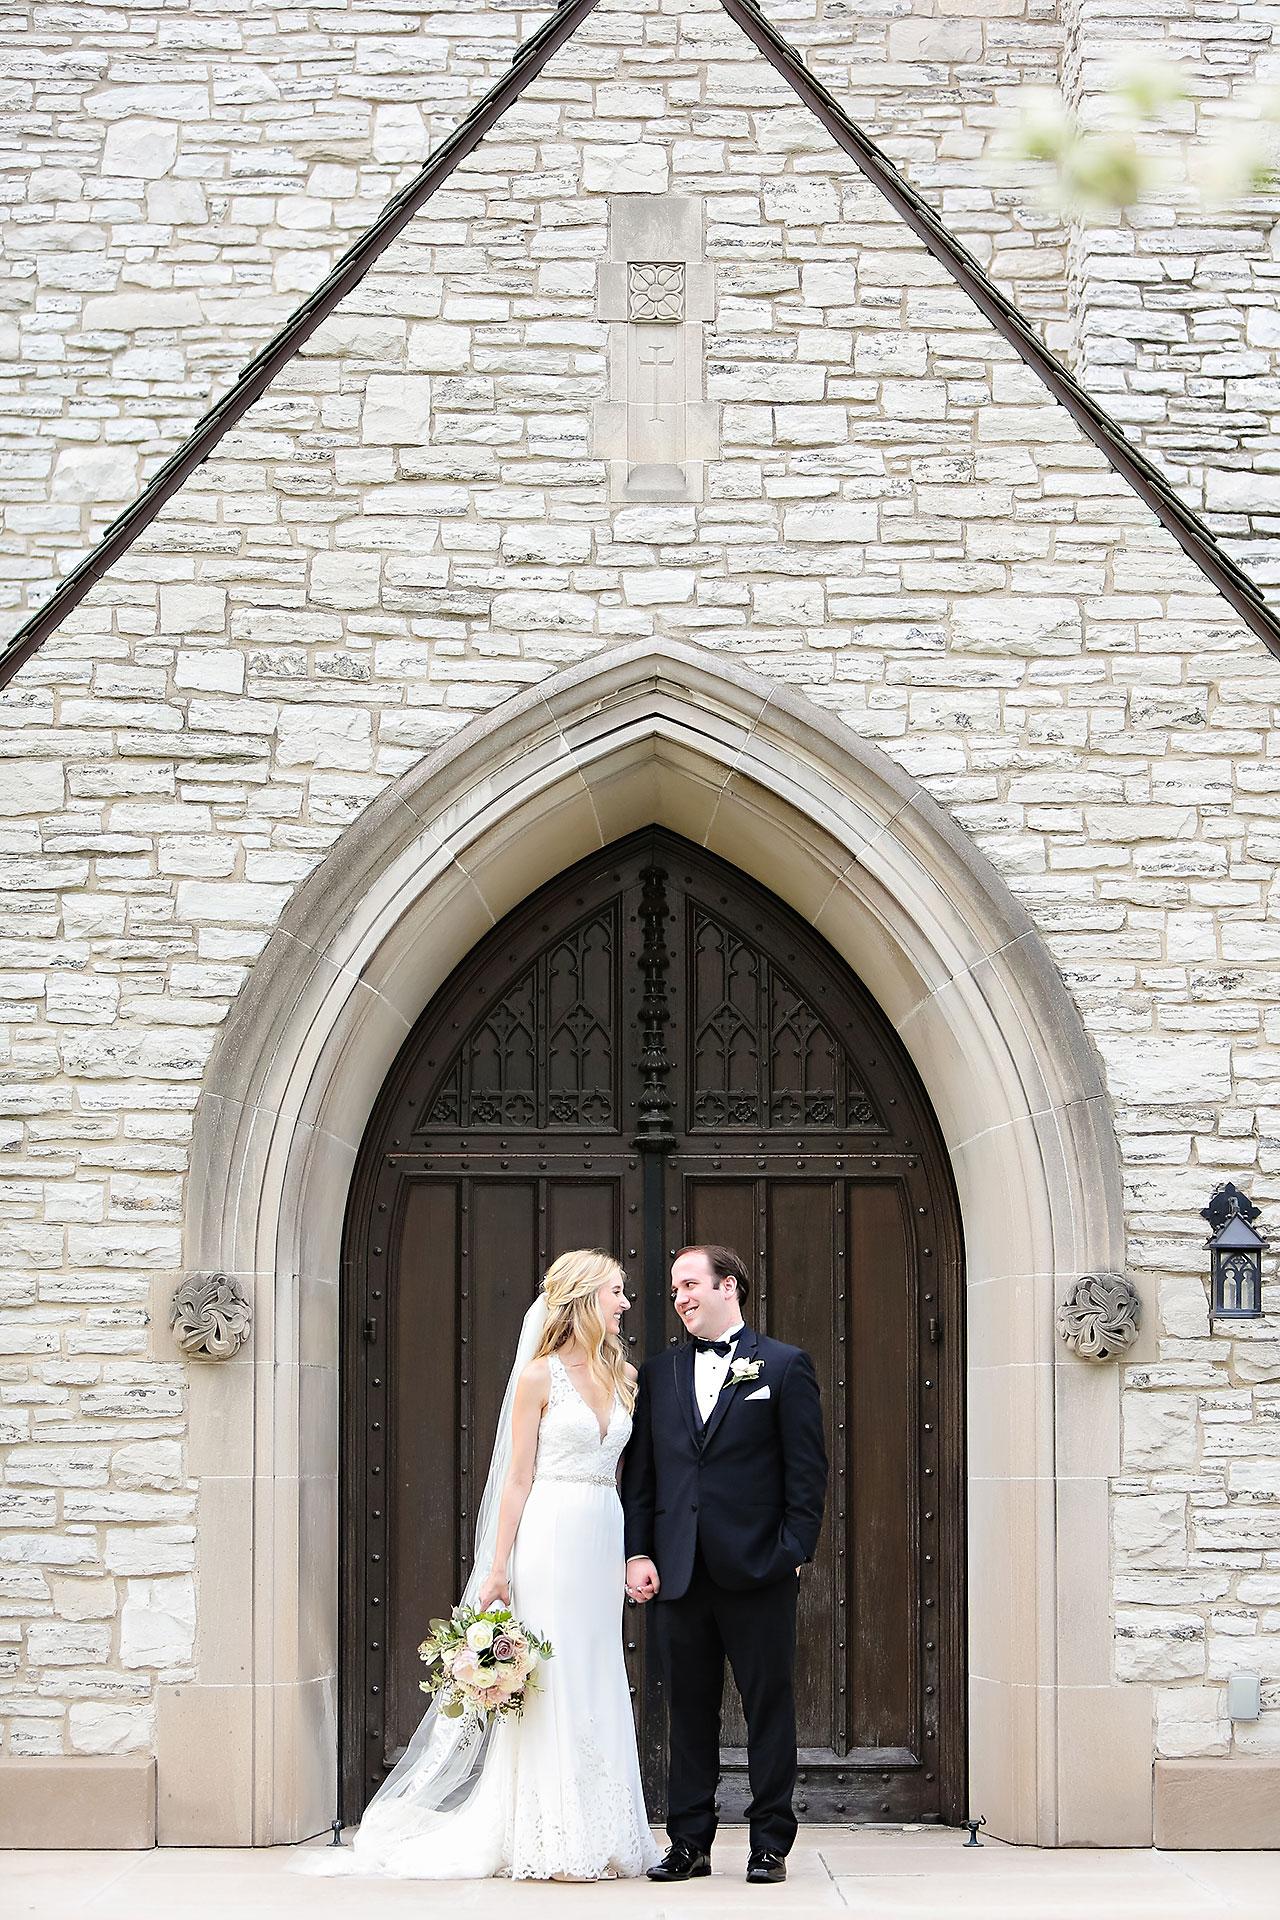 Allison Jeff Union Station Crowne Plaza Indianapolis wedding 250